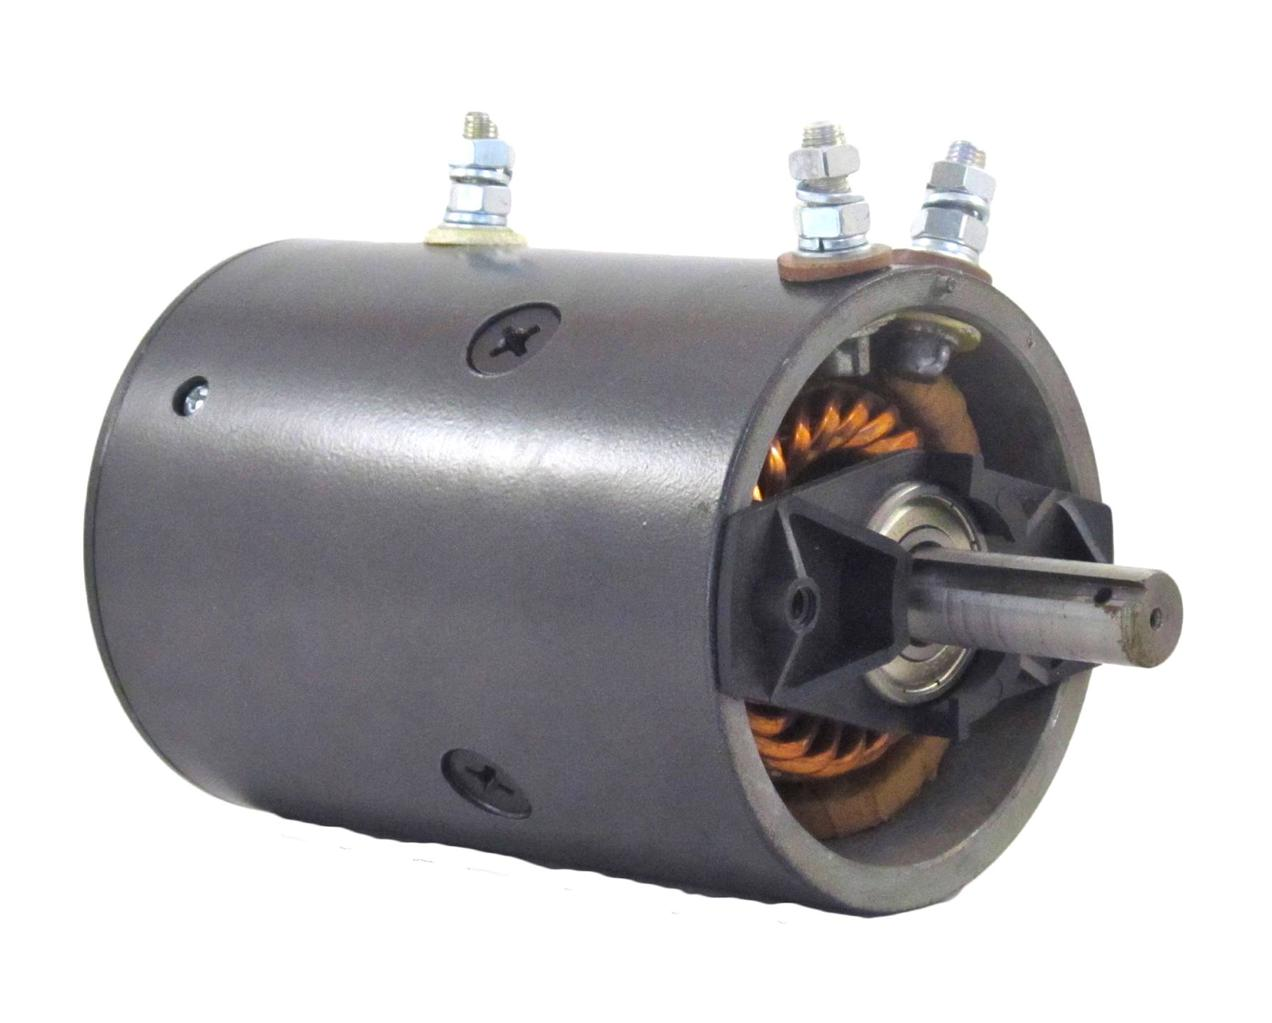 braden winch motor wiring 3 wire winch motor wiring diagram new 12v winch motor warn winch 462262 mbj-4401 mbj-4401s ...